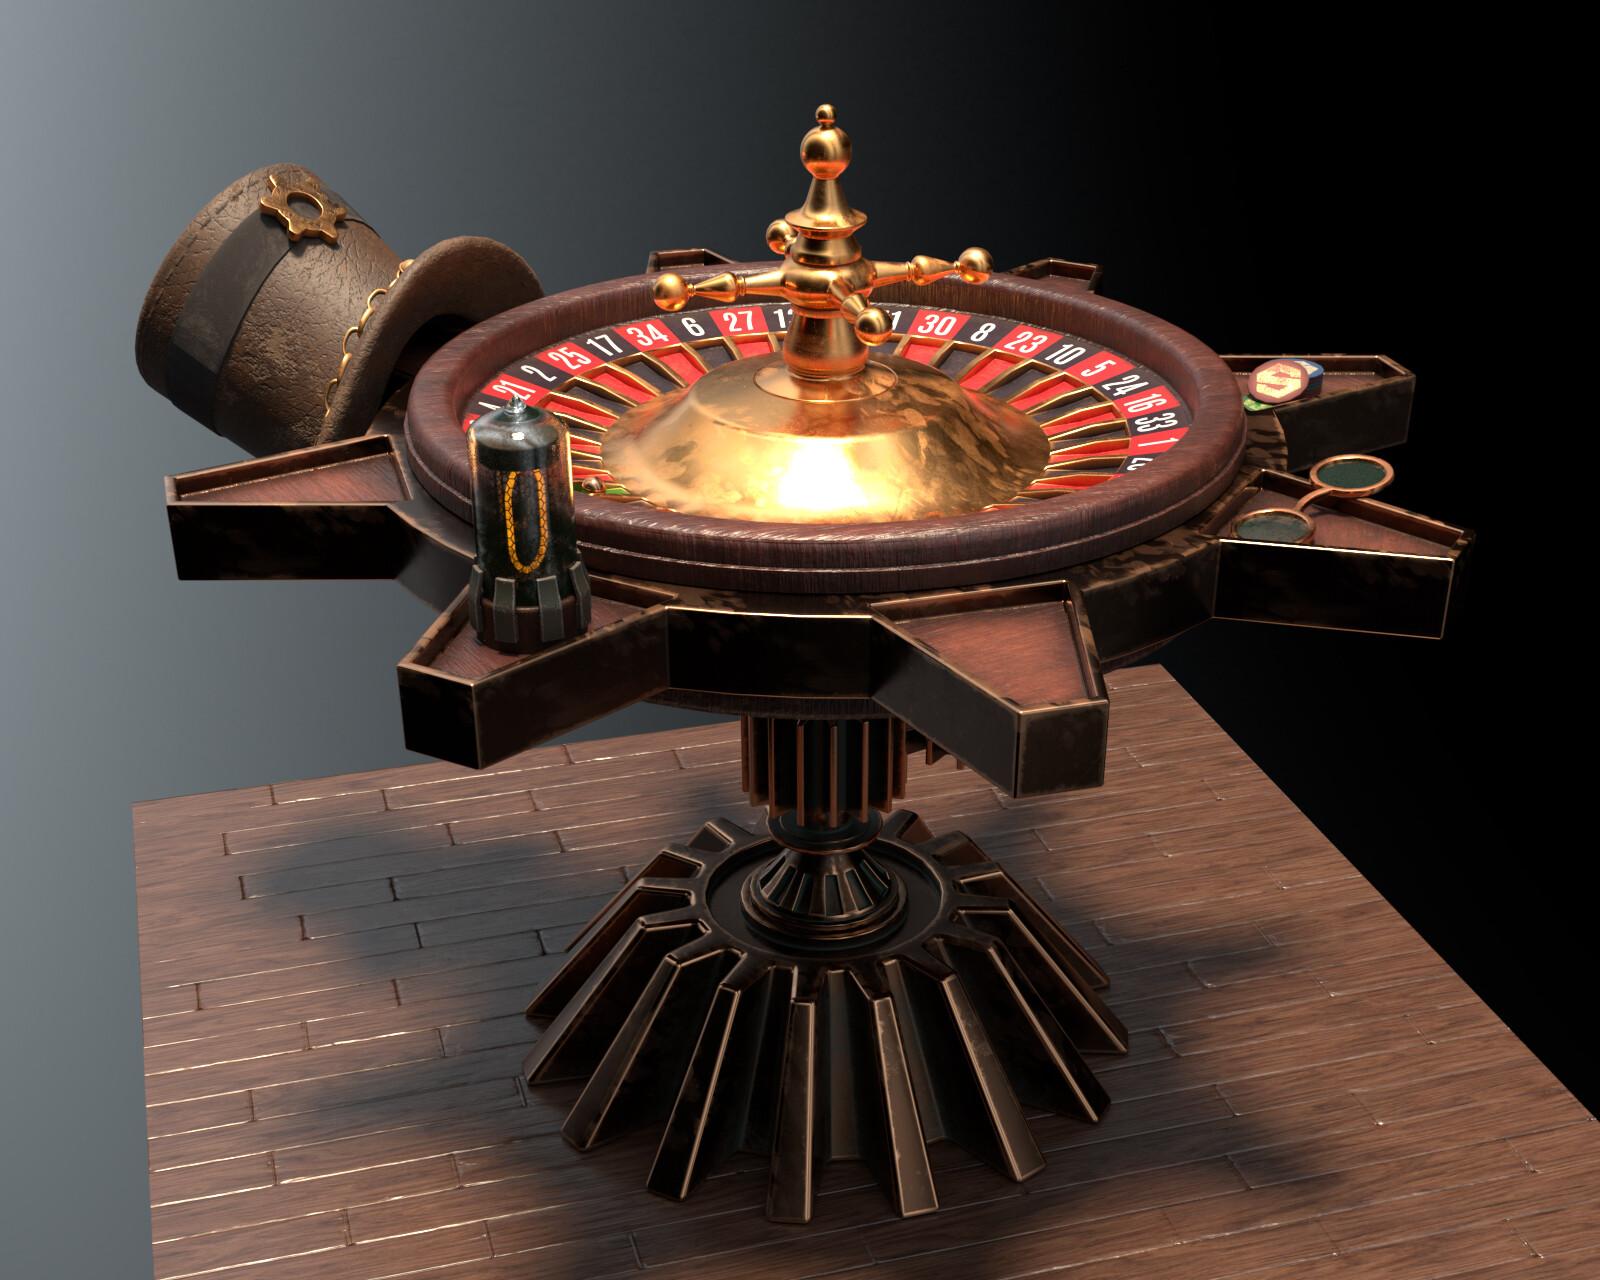 Roulette fallout new vegas